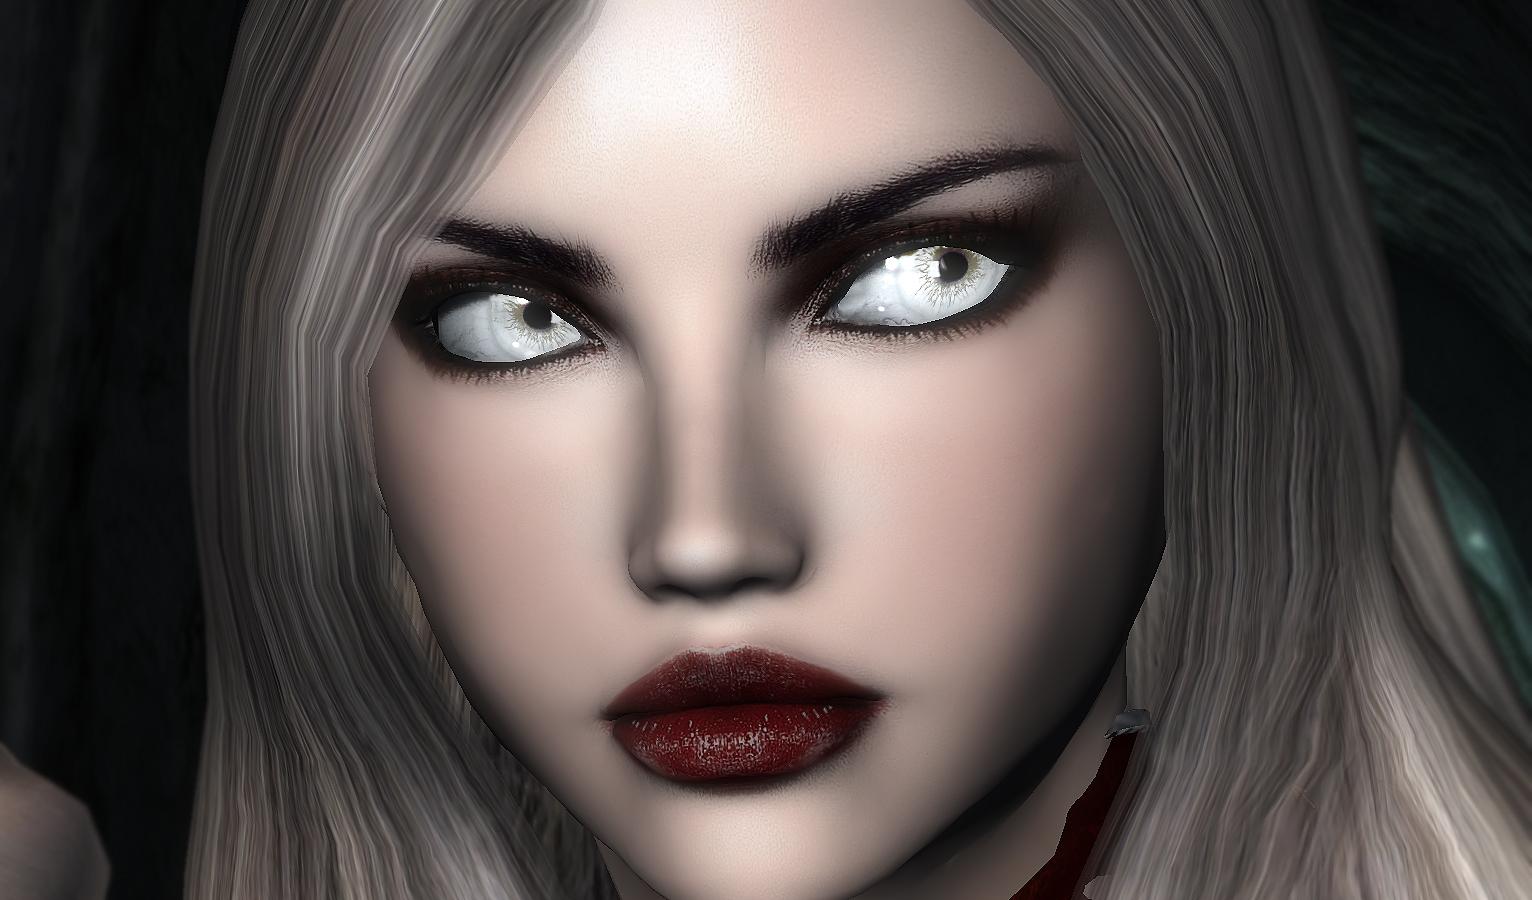 Site de rencontre humain vampire